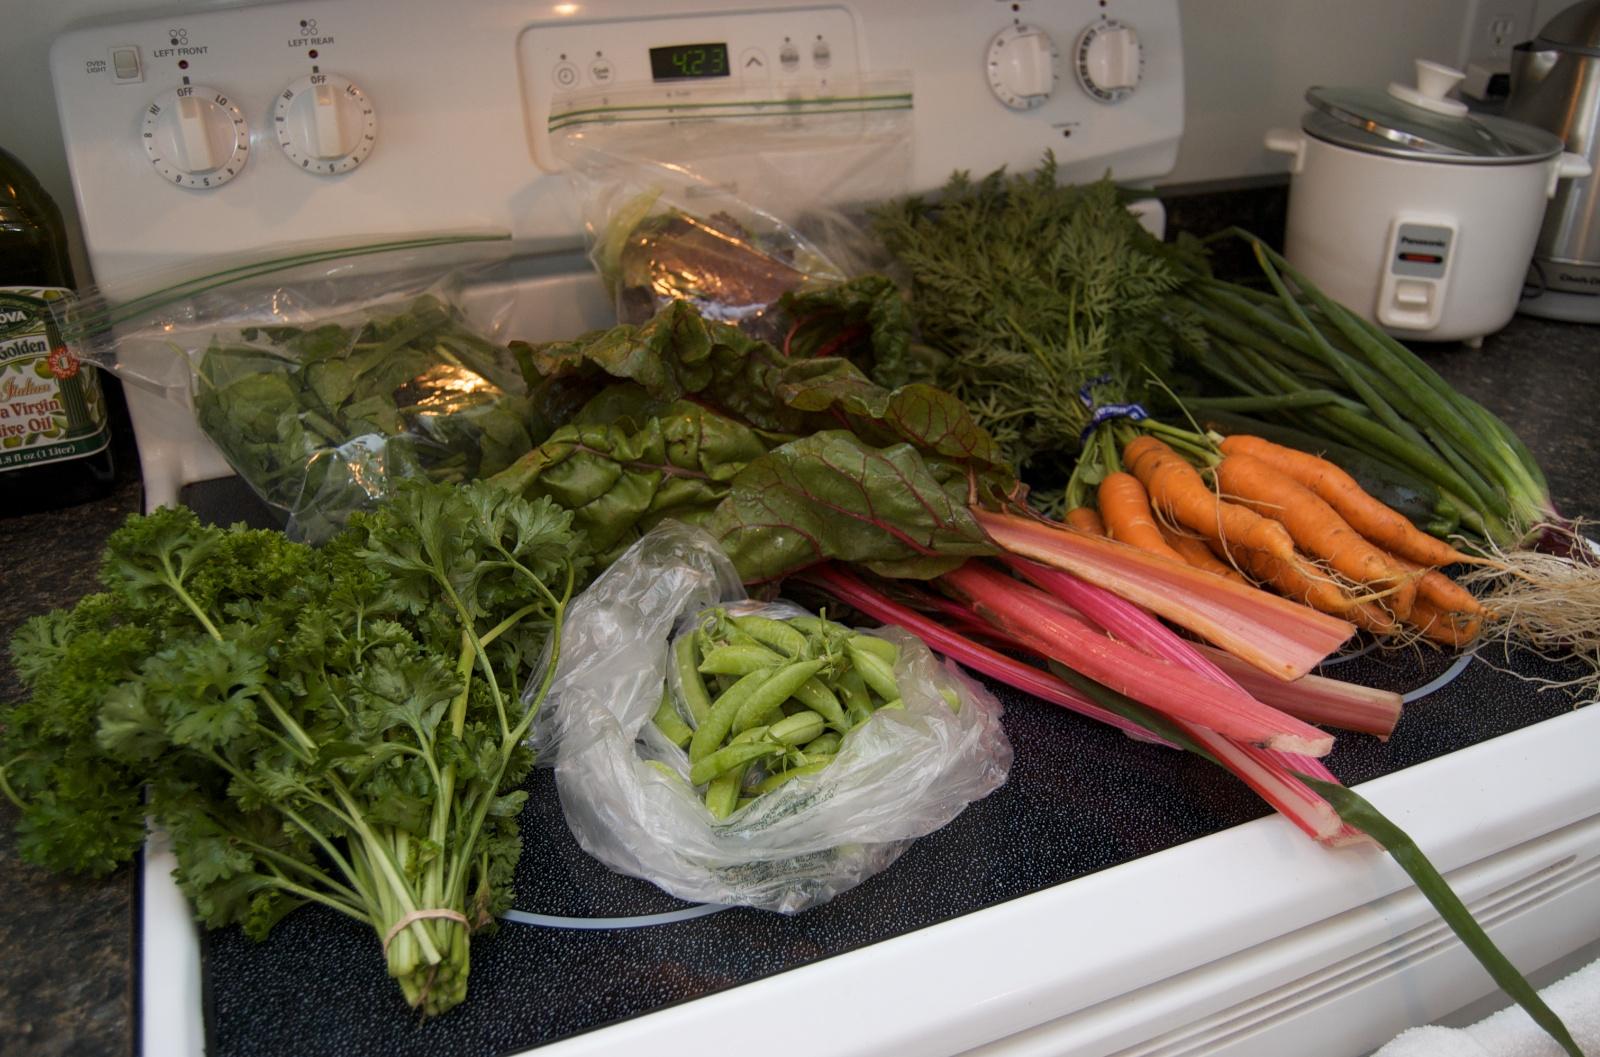 http://blog.rickk.com/food/2010/07/08/csa4-1.jpg